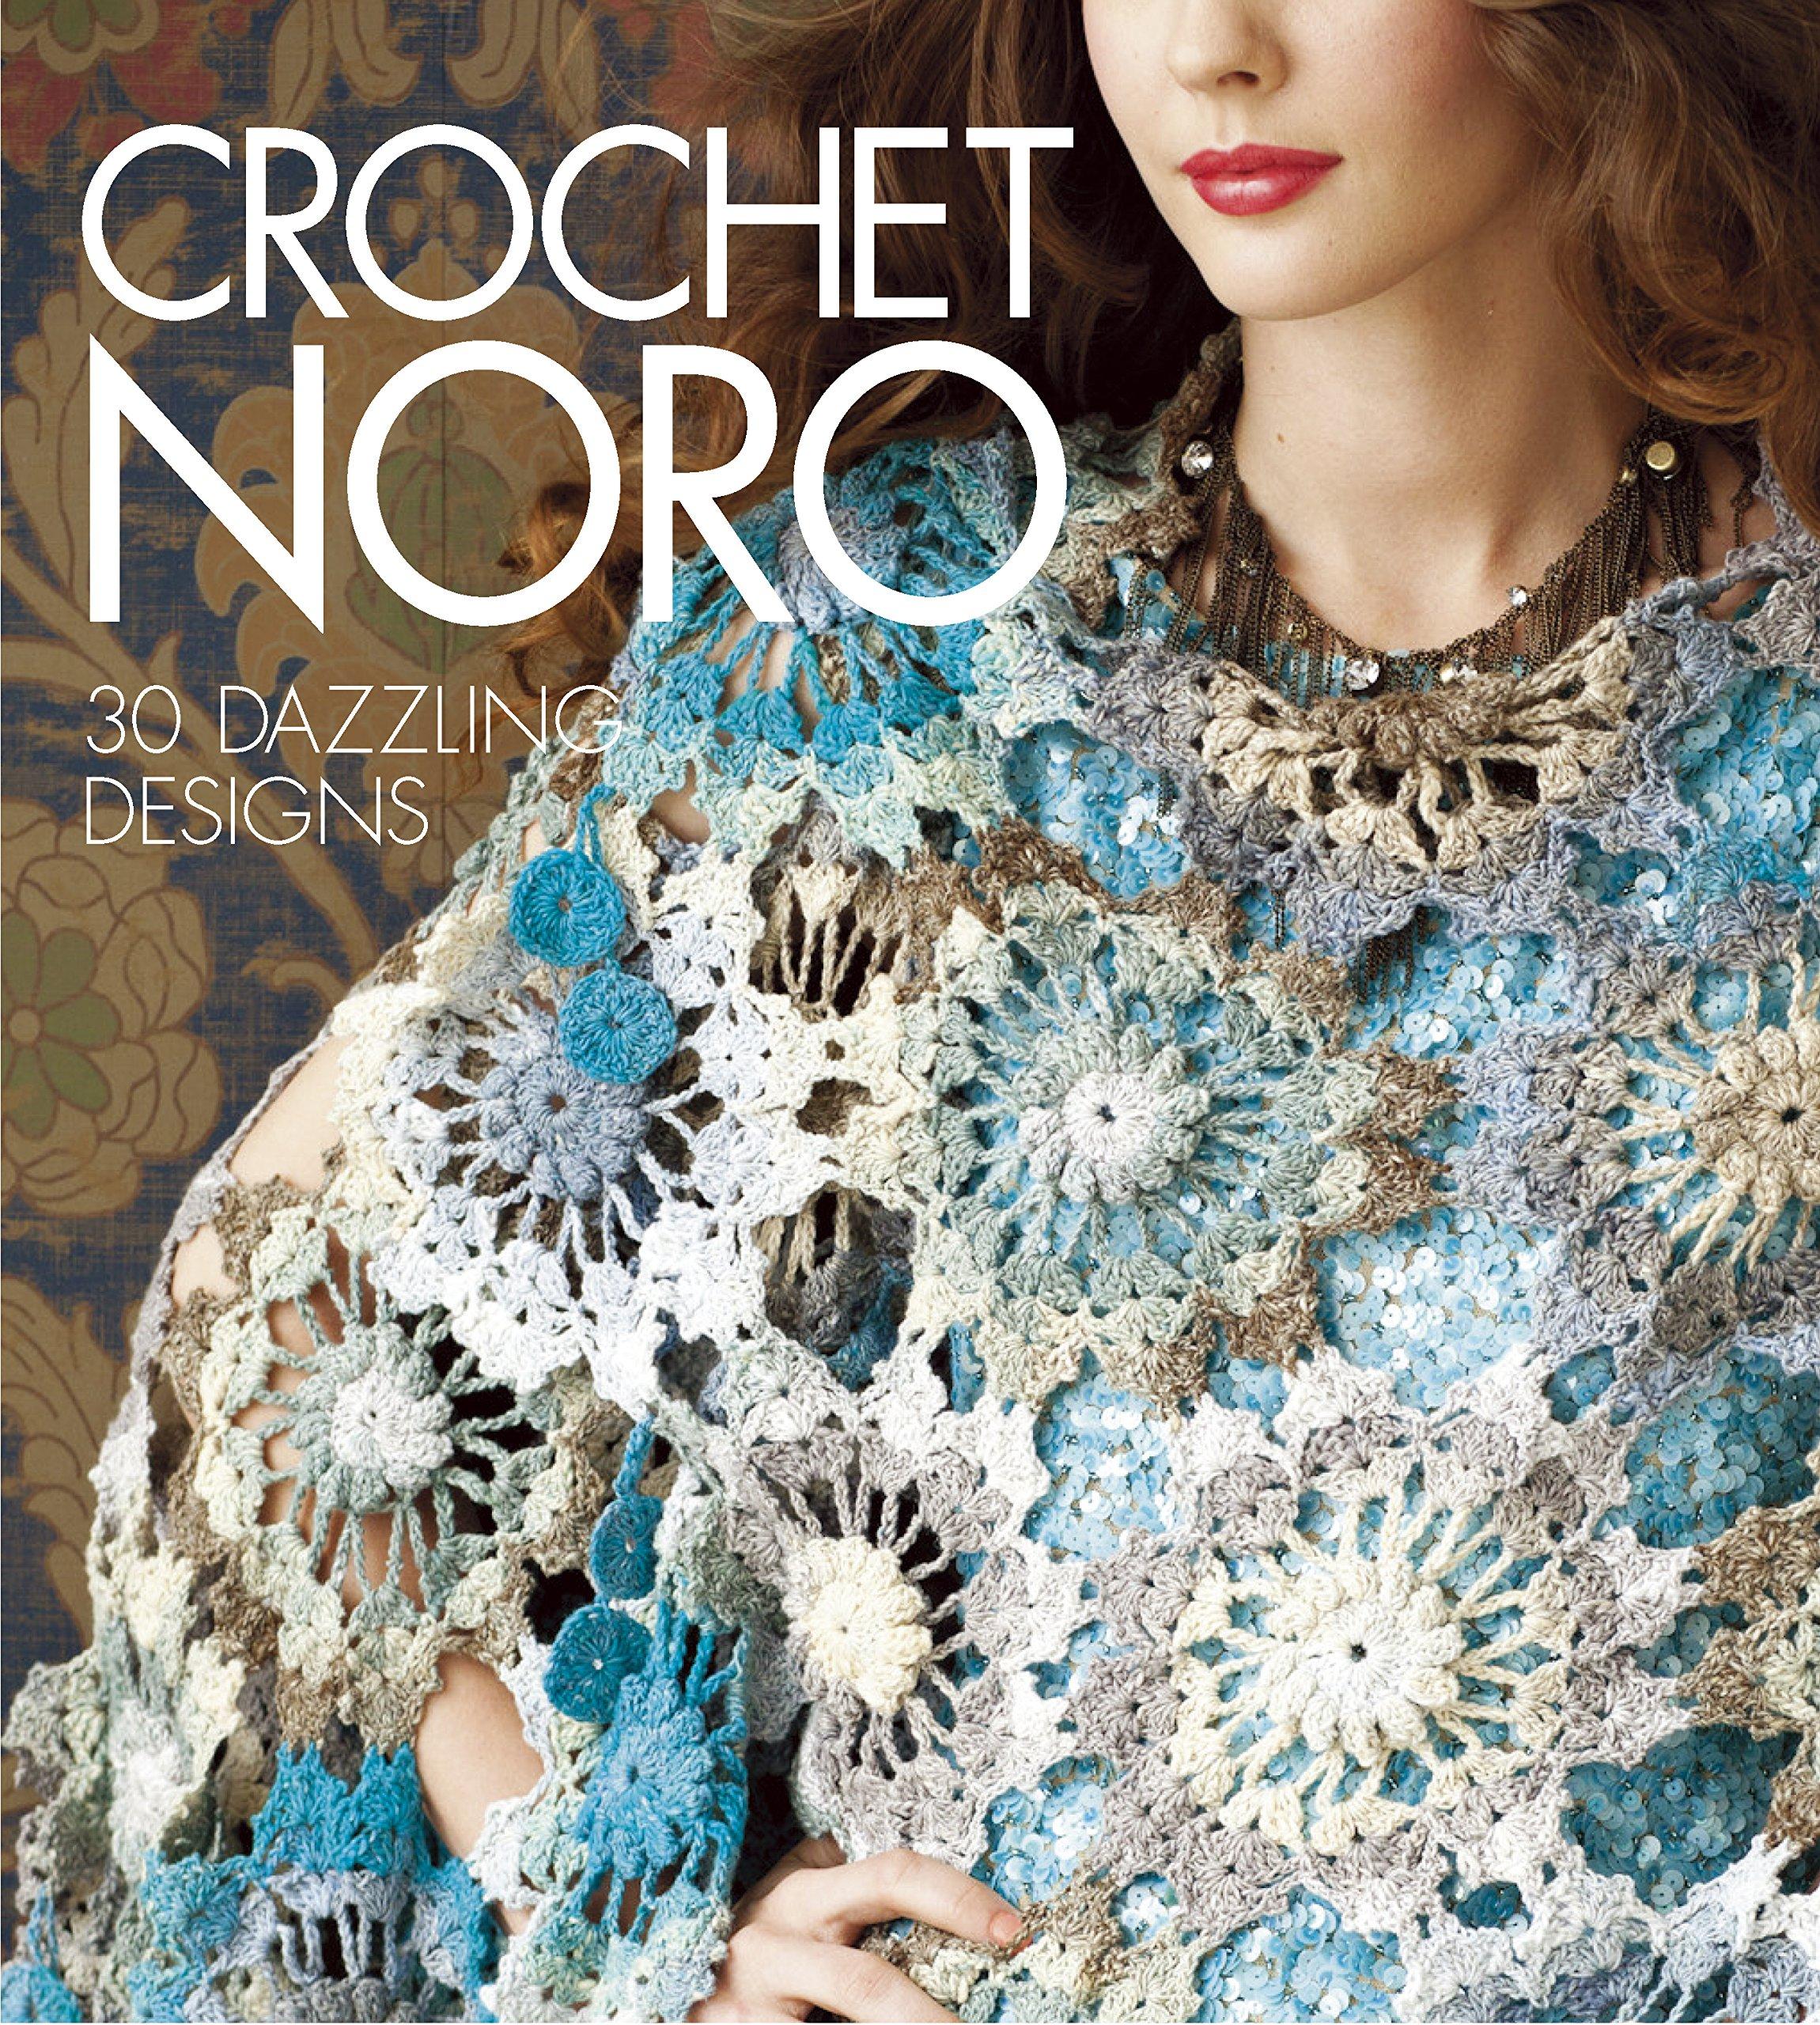 Crochet Noro: 30 Dazzling Designs (Sixth & Spring Books)